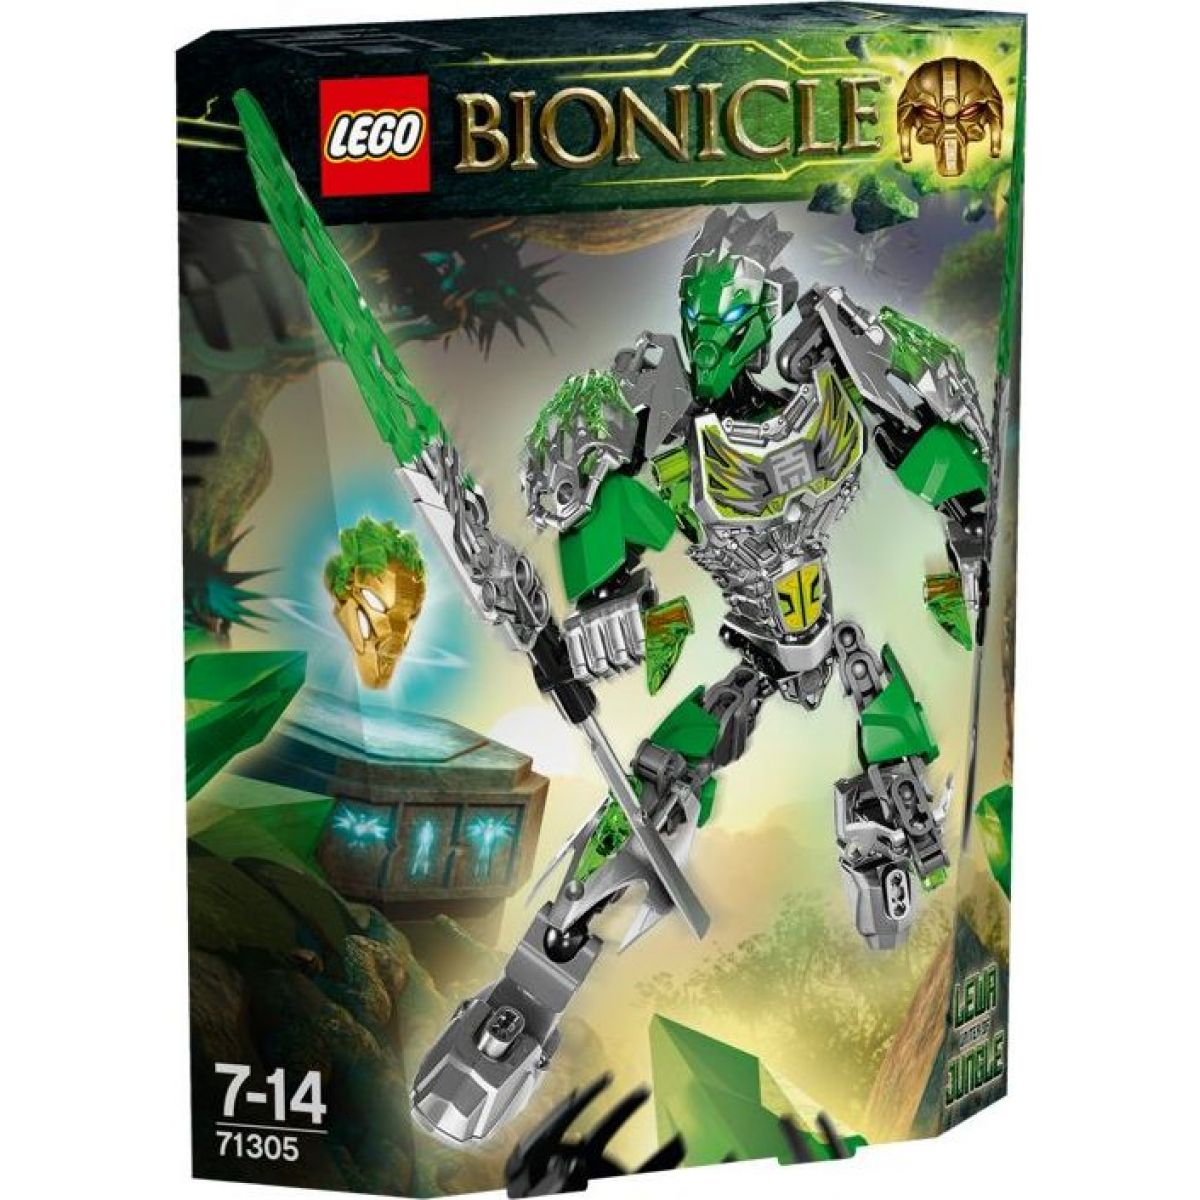 LEGO Bionicle 71305 Lewa Sjednotitel džungle